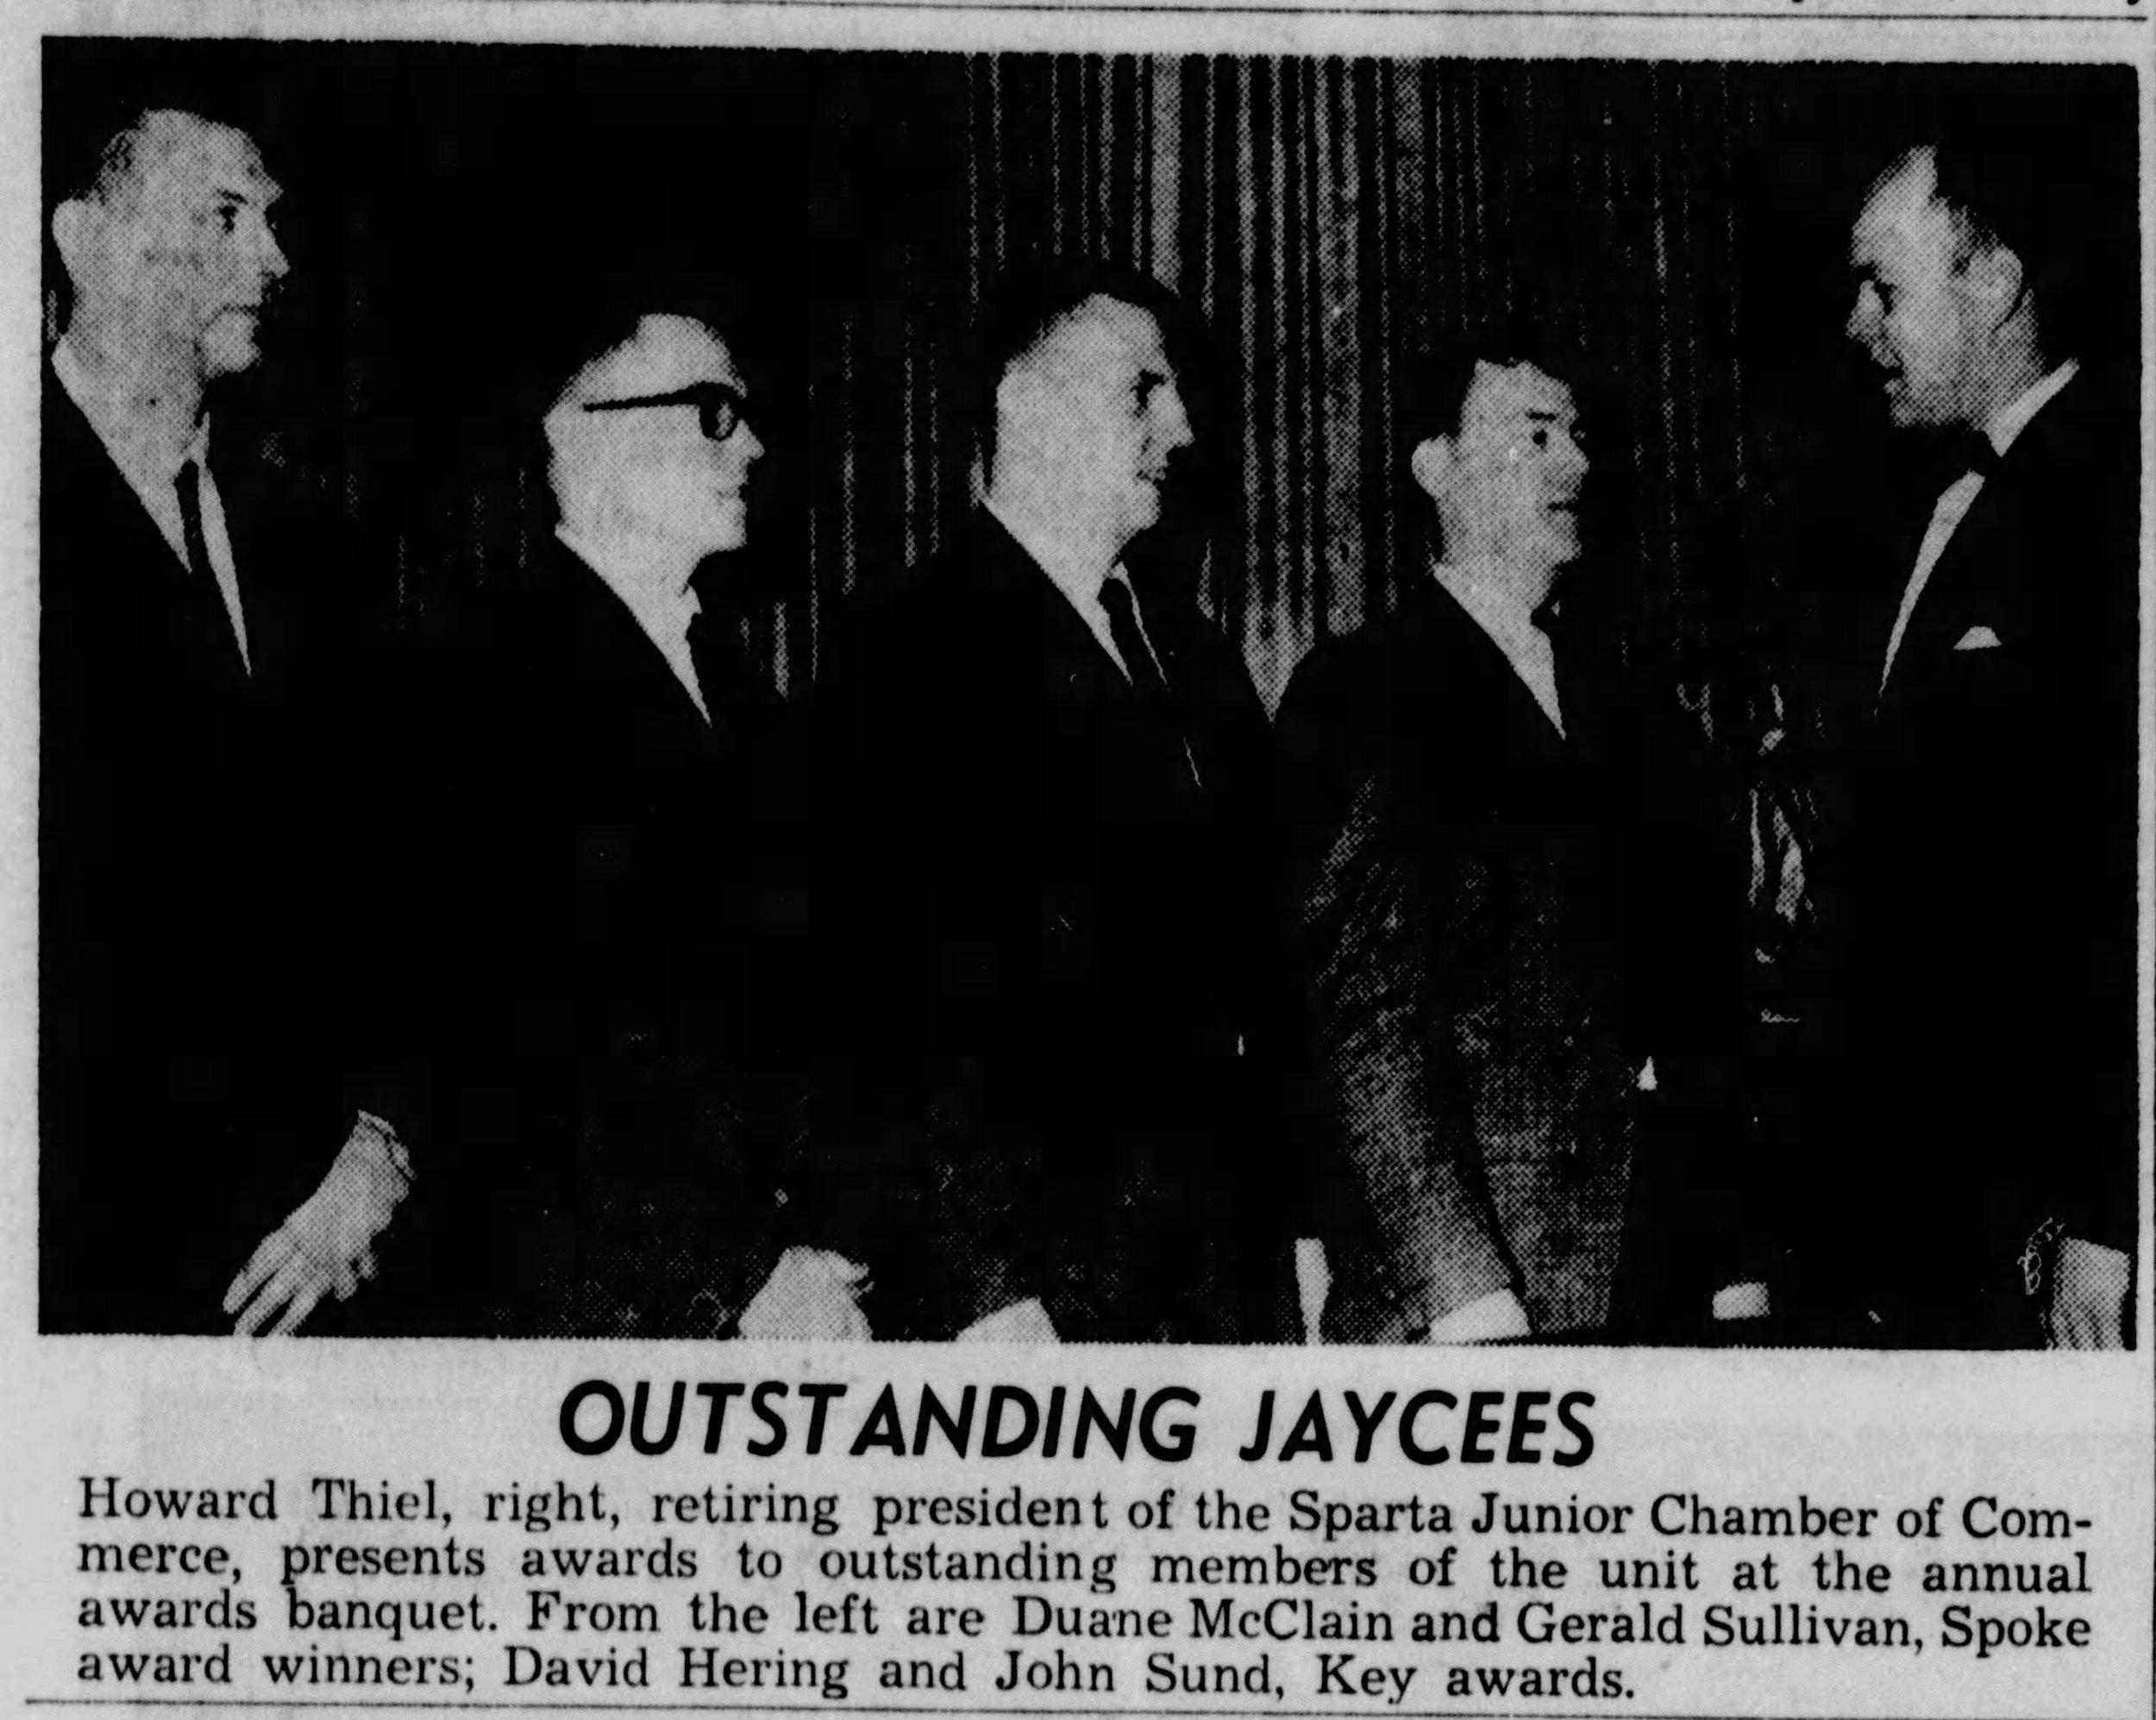 The La Crosse Tribune - April 10, 1963